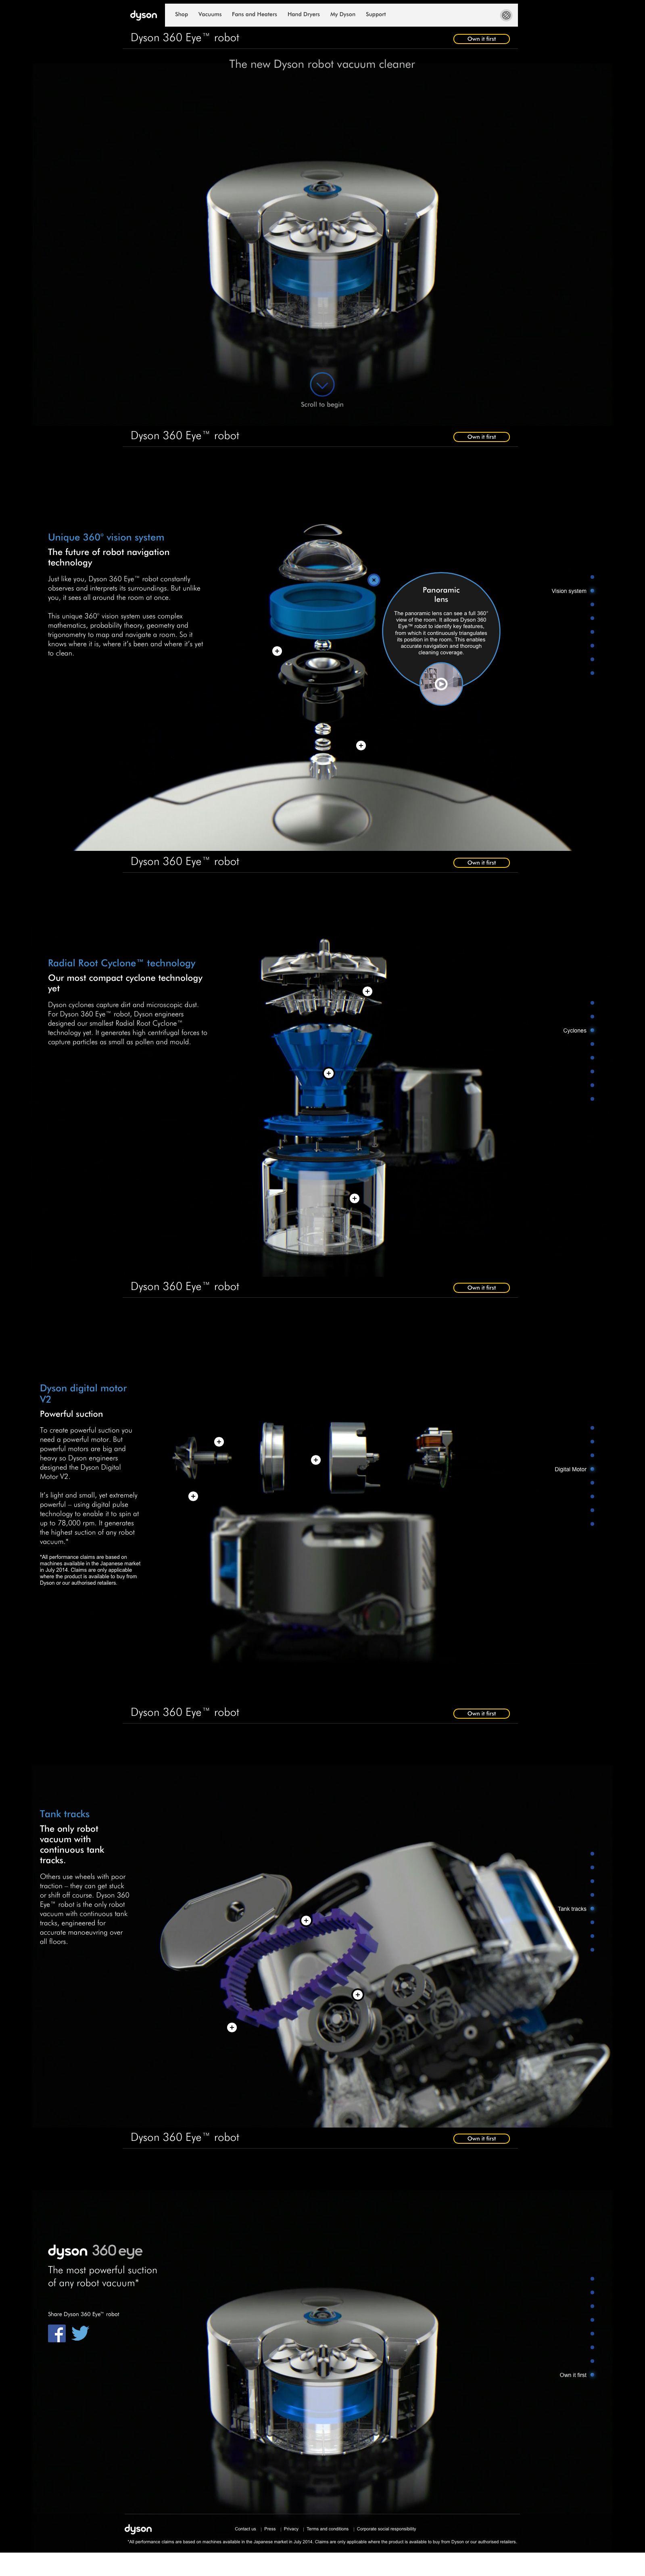 Dyson 360 Eye Robot Aspirateur Dyson Corporate Design Web Design Design